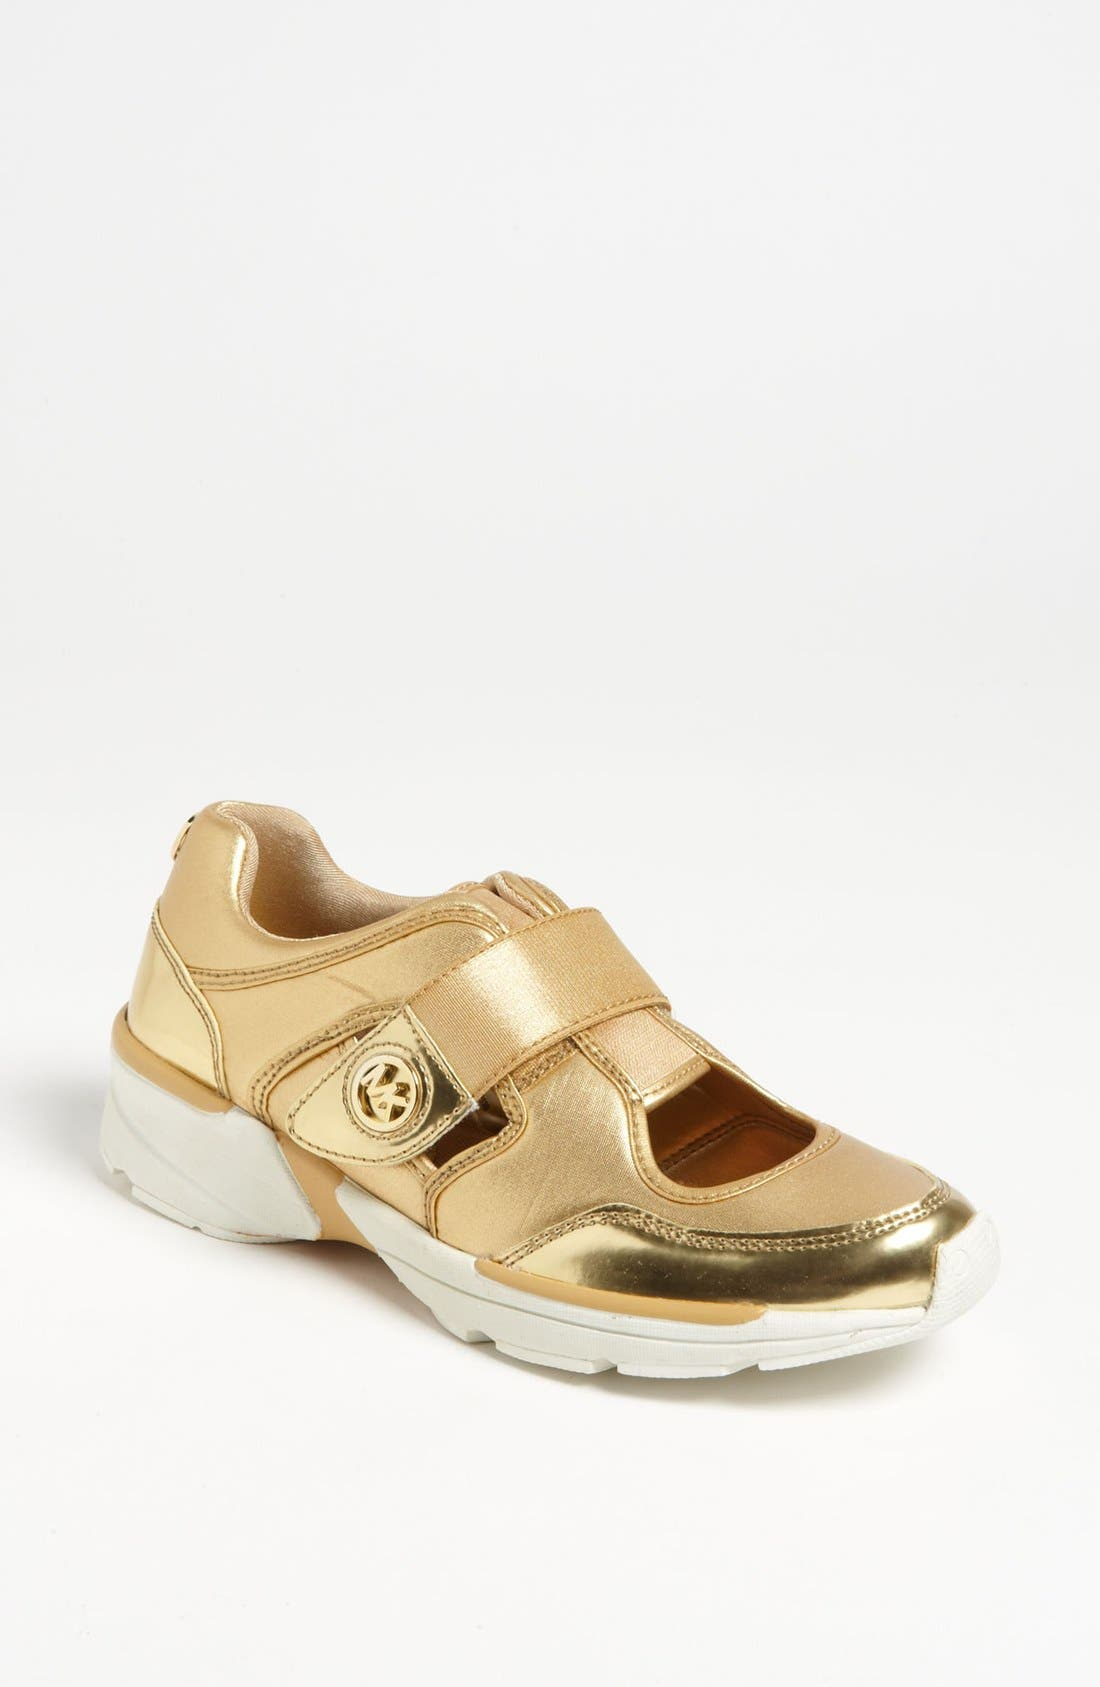 Alternate Image 1 Selected - MICHAEL Michael Kors 'Walker' Cutout Sneaker